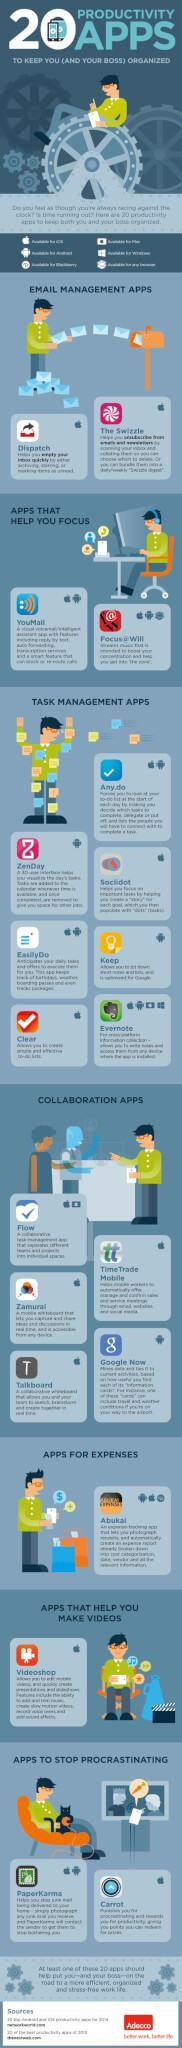 apps-mas-productivo-infografia